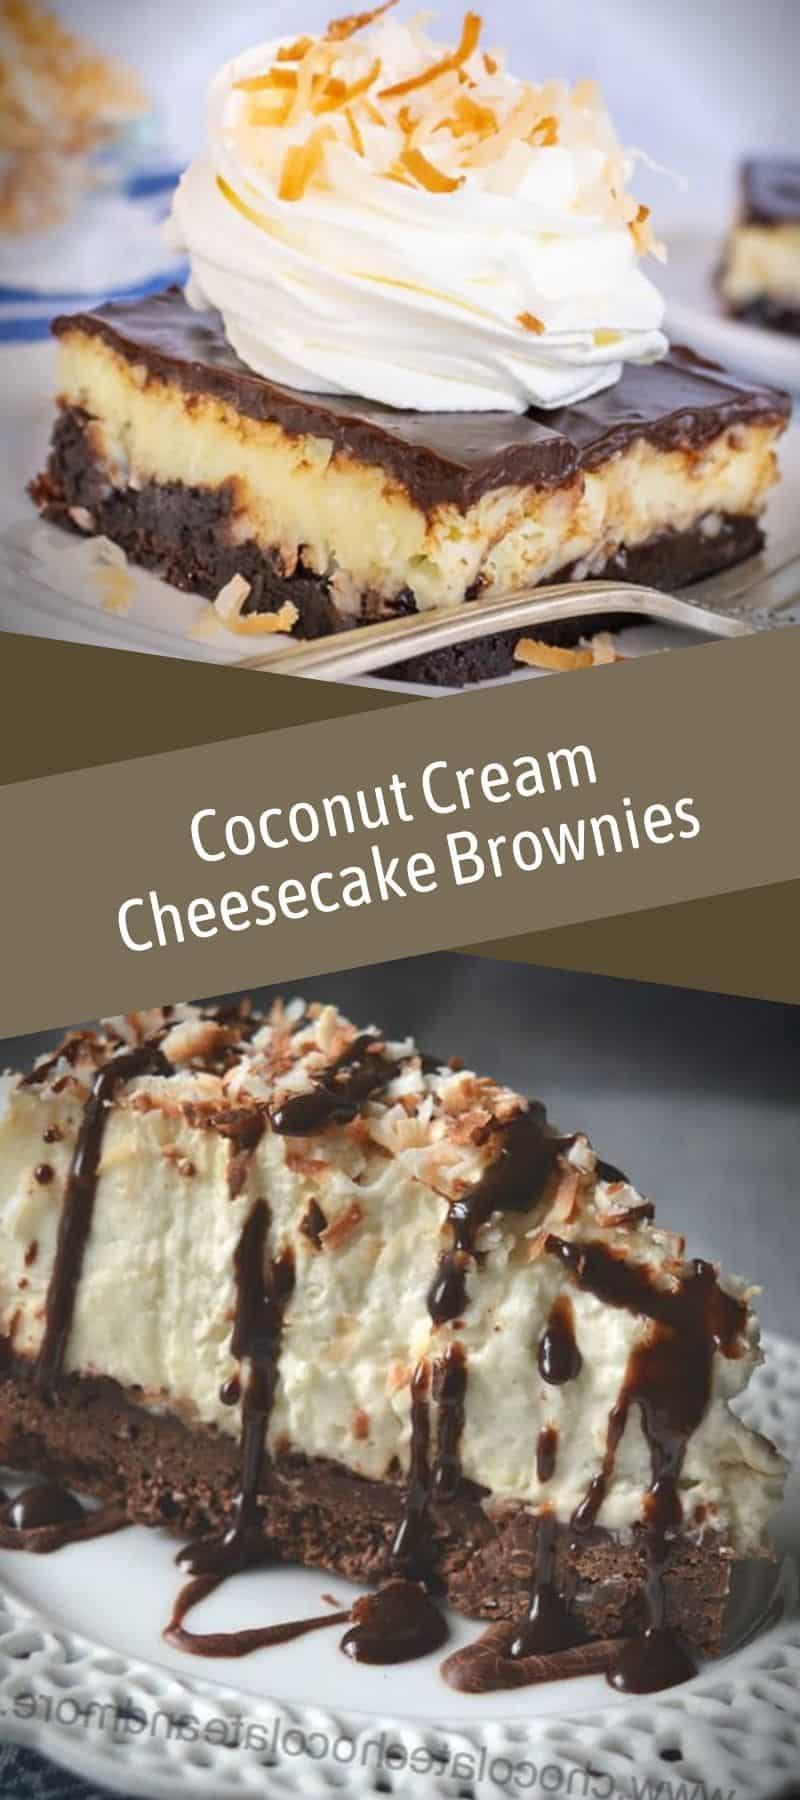 Coconut Cream Cheesecake Brownies Recipe 3